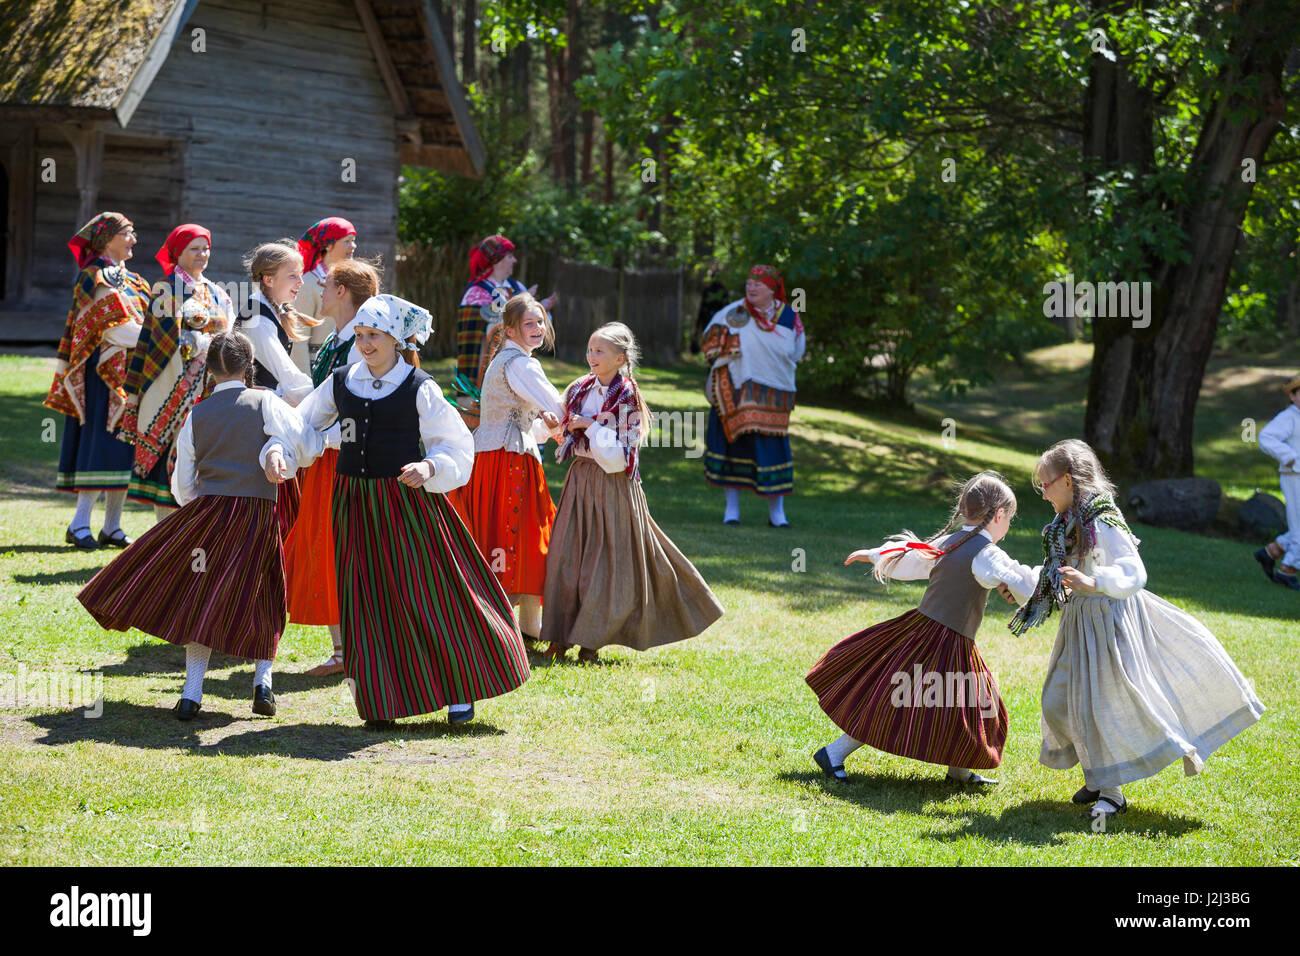 RIGA, LATVIA - 12 JUN 2016: Latvian dancers in national costumes. Cultural event in Latvian Ethnographic Museum. - Stock Image